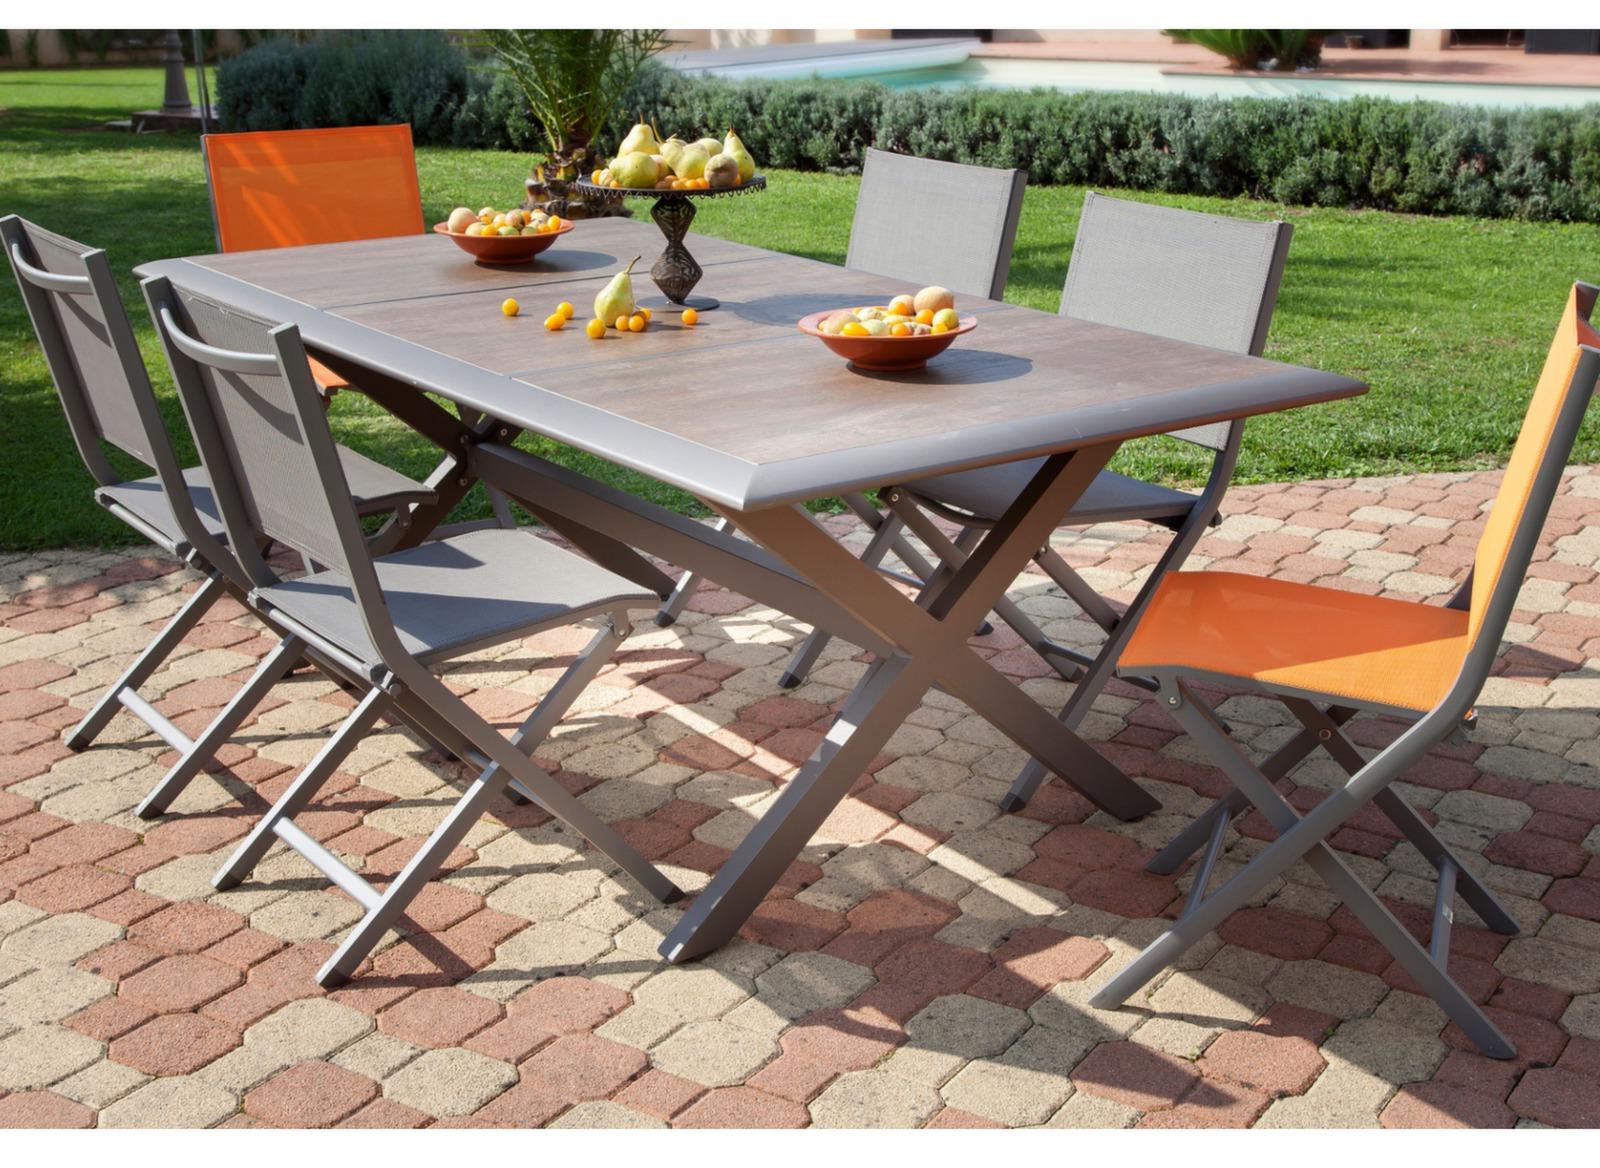 Vente privee mobilier jardin latest vente prive mobilier for Vente mobilier jardin